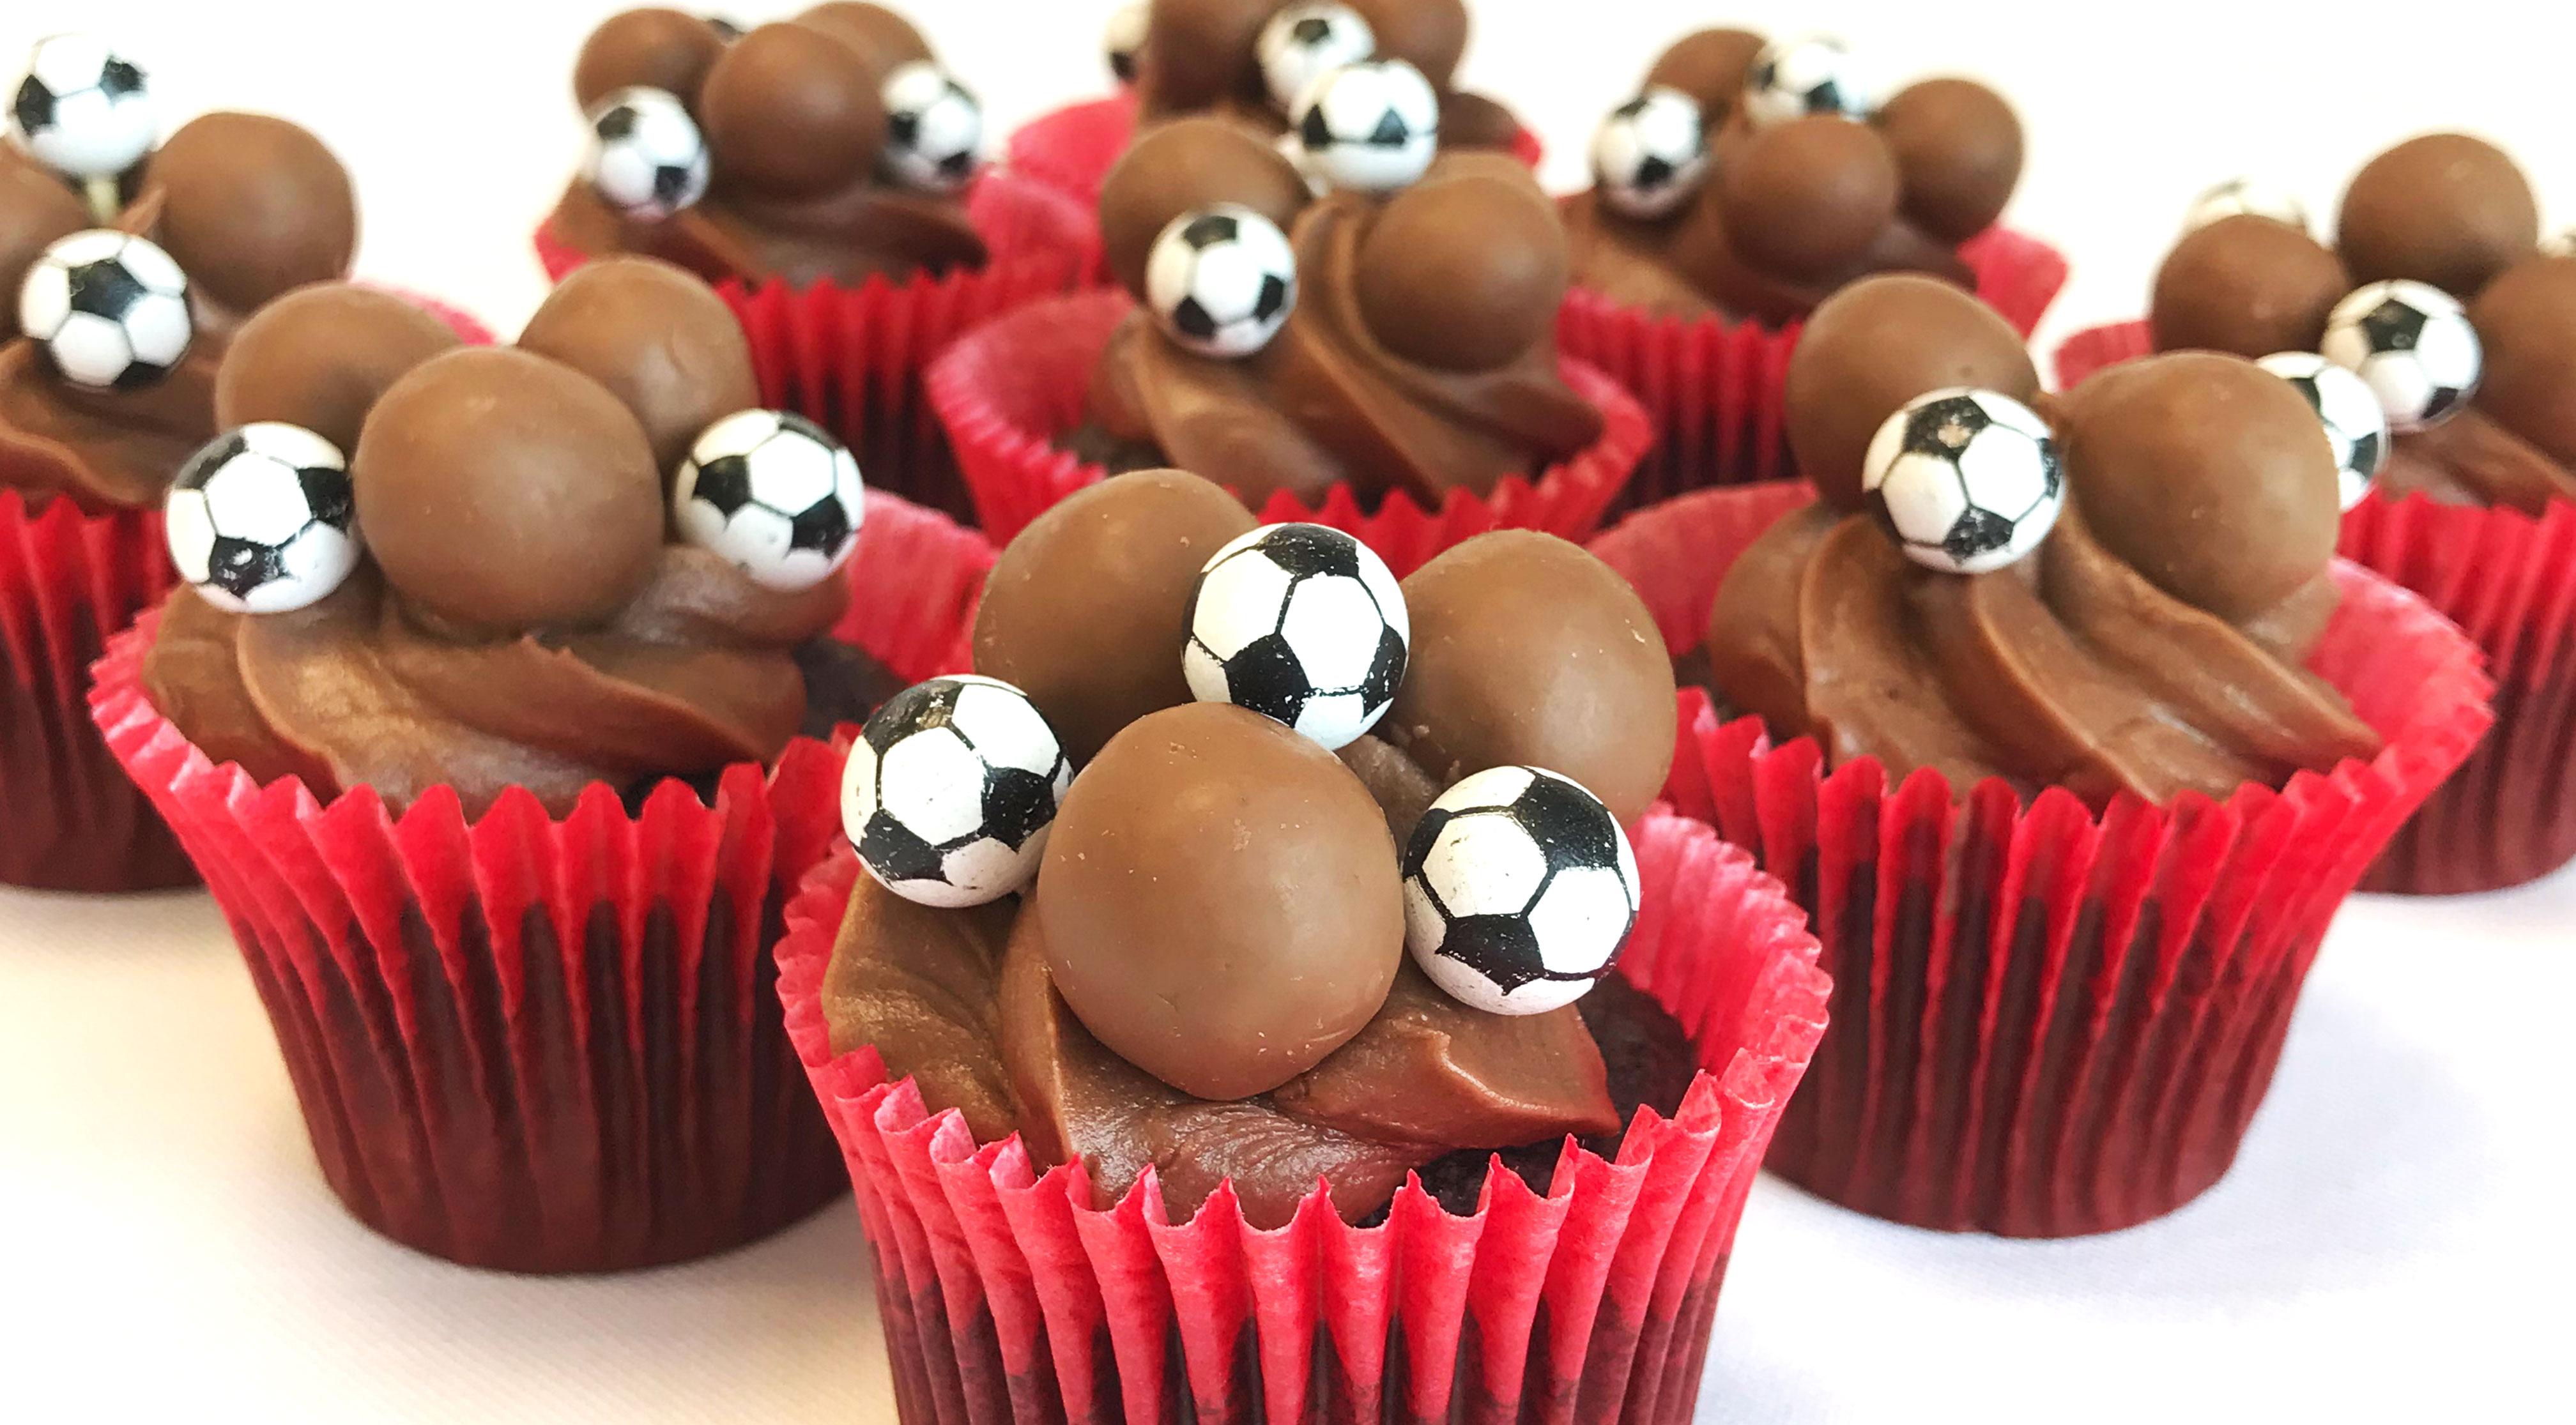 Malteaser World Cup Cakes Recipe